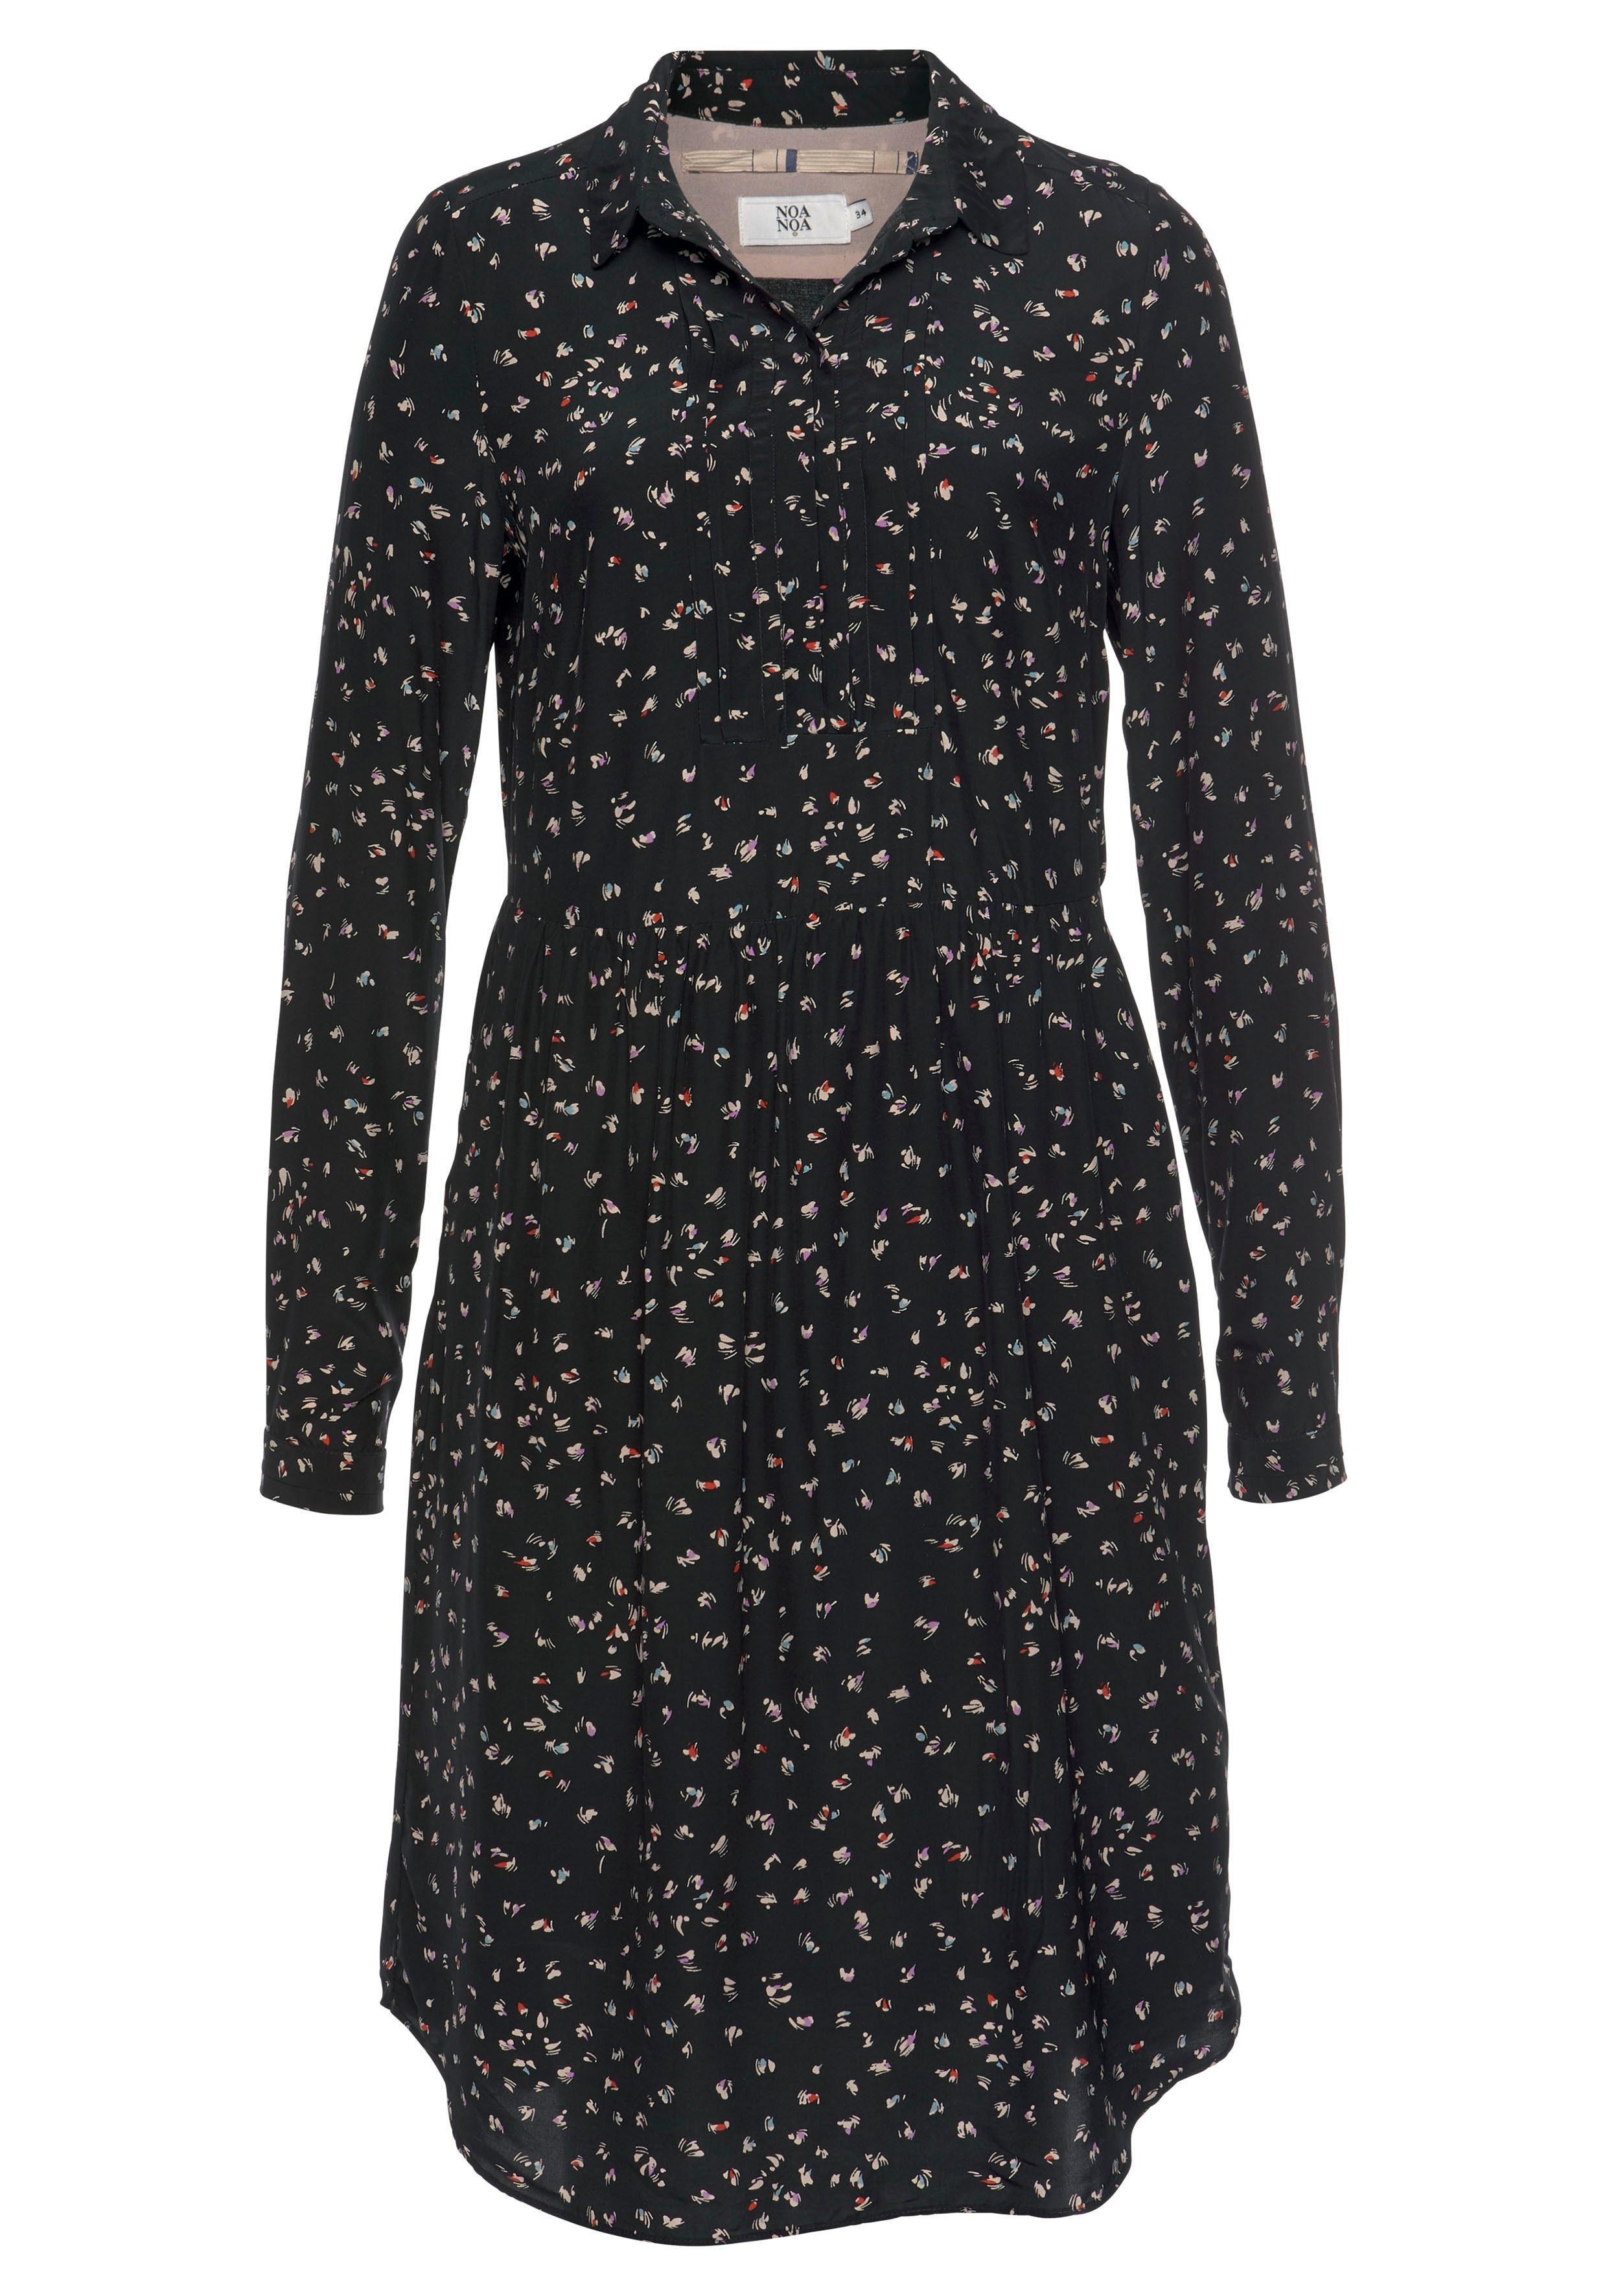 NOA NOA A-Linien-Kleid Damenmode/Bekleidung/Kleider/Ballkleider